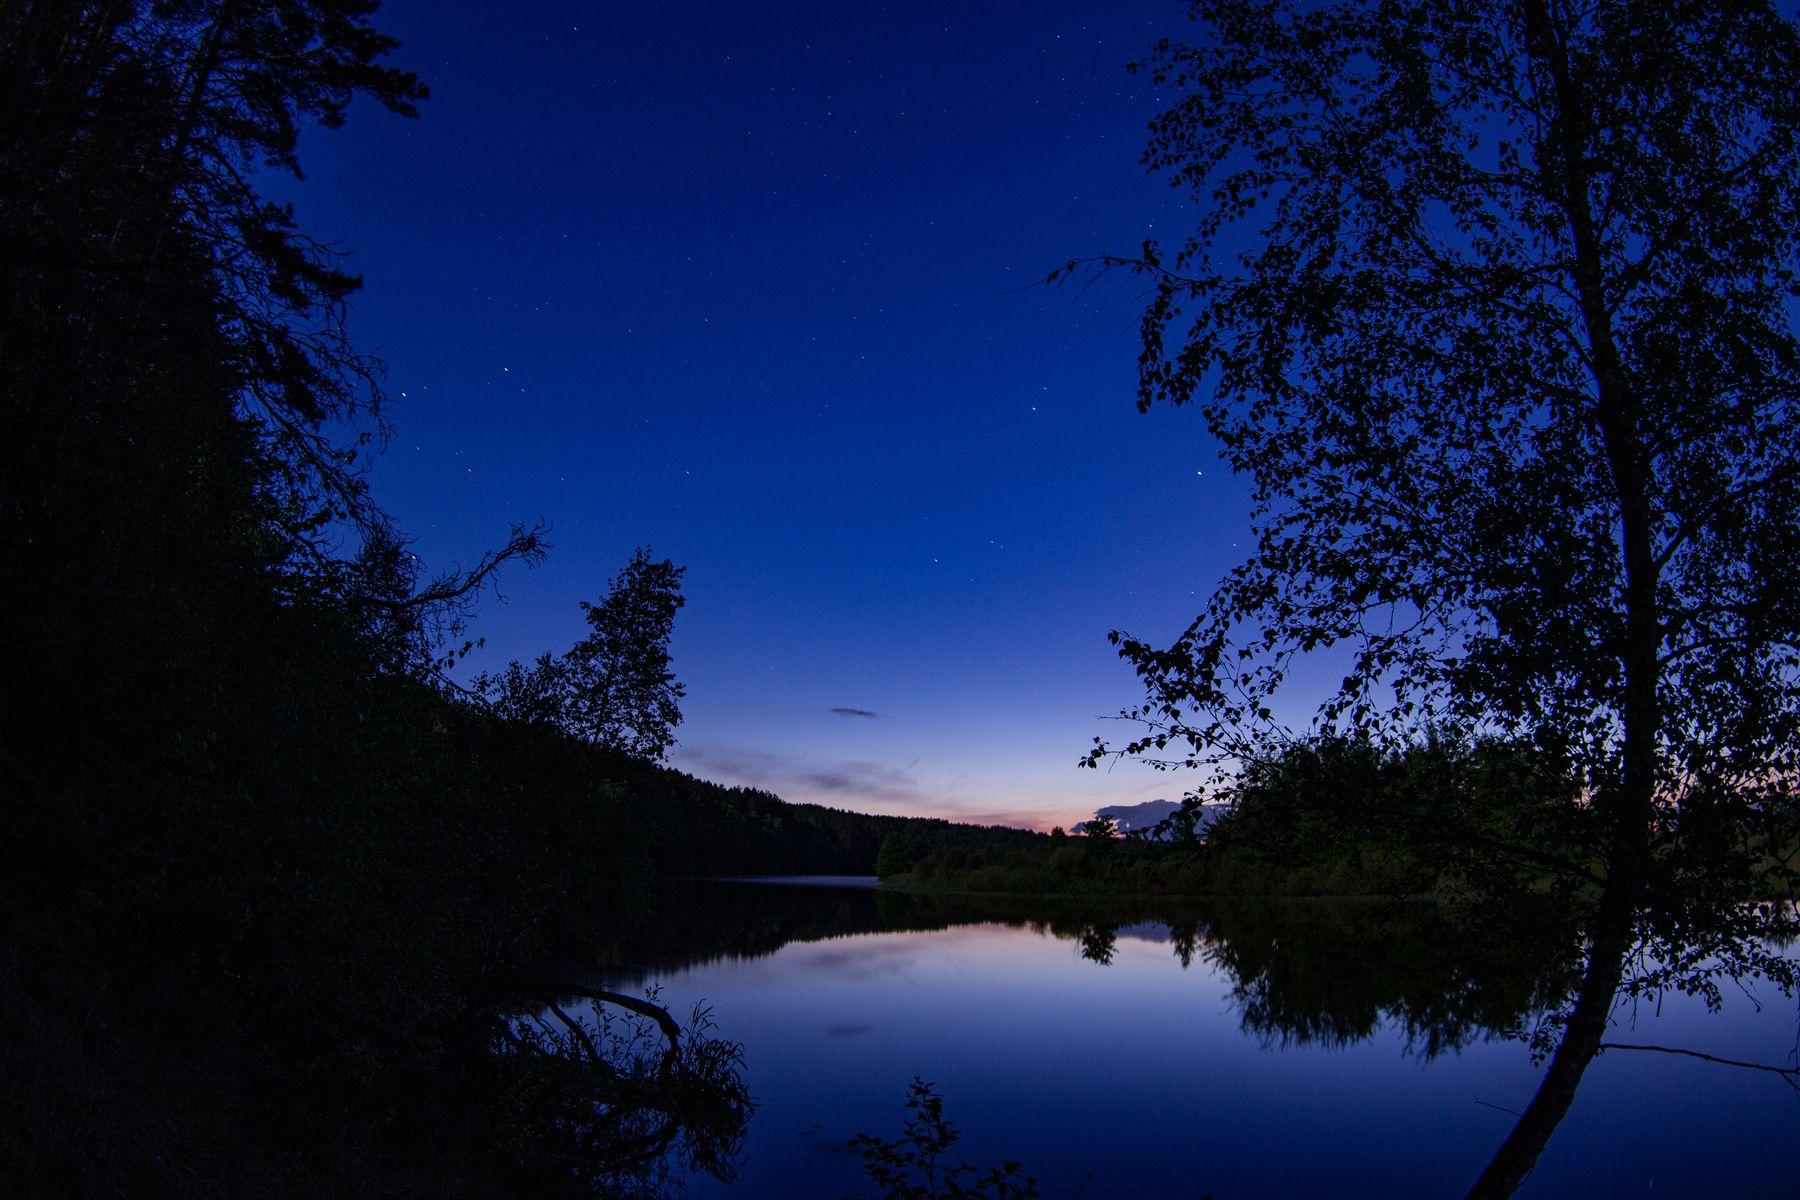 Ночью у реки ночь река небо дерево сумерки